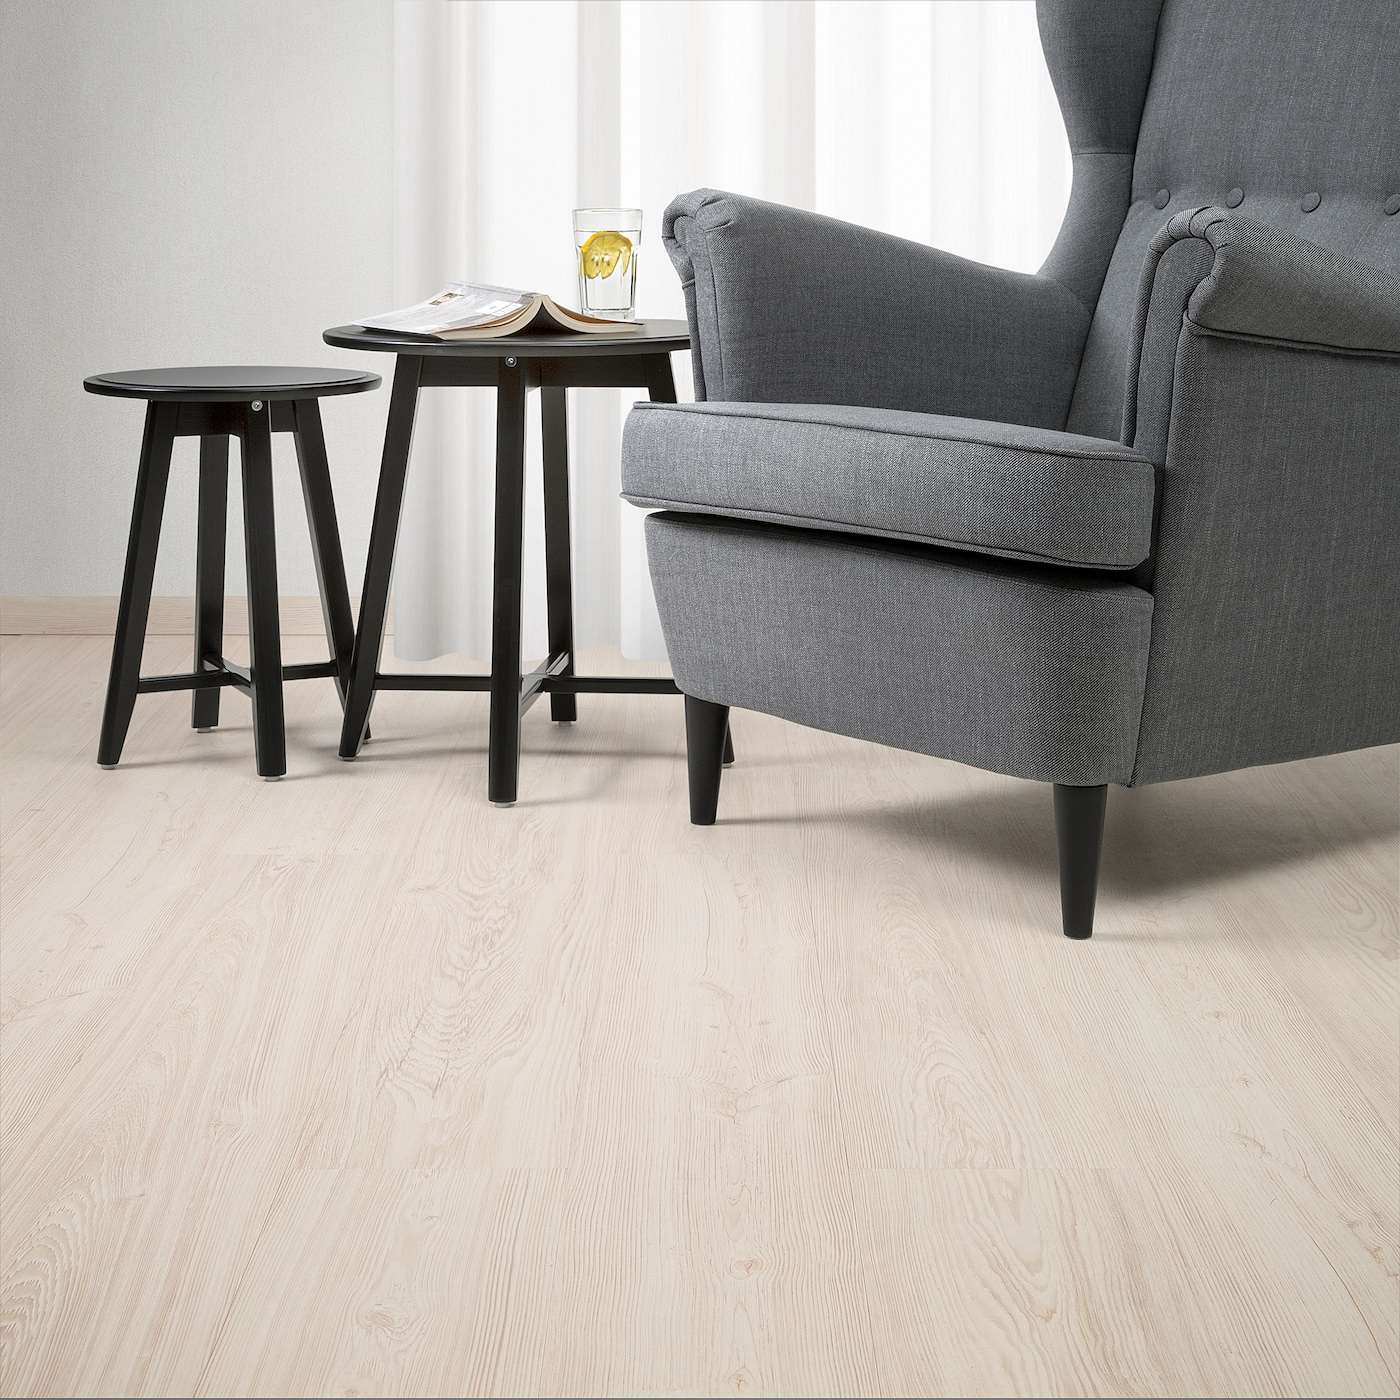 SLÄTTEN Laminated flooring - pine effect 4.4 m²